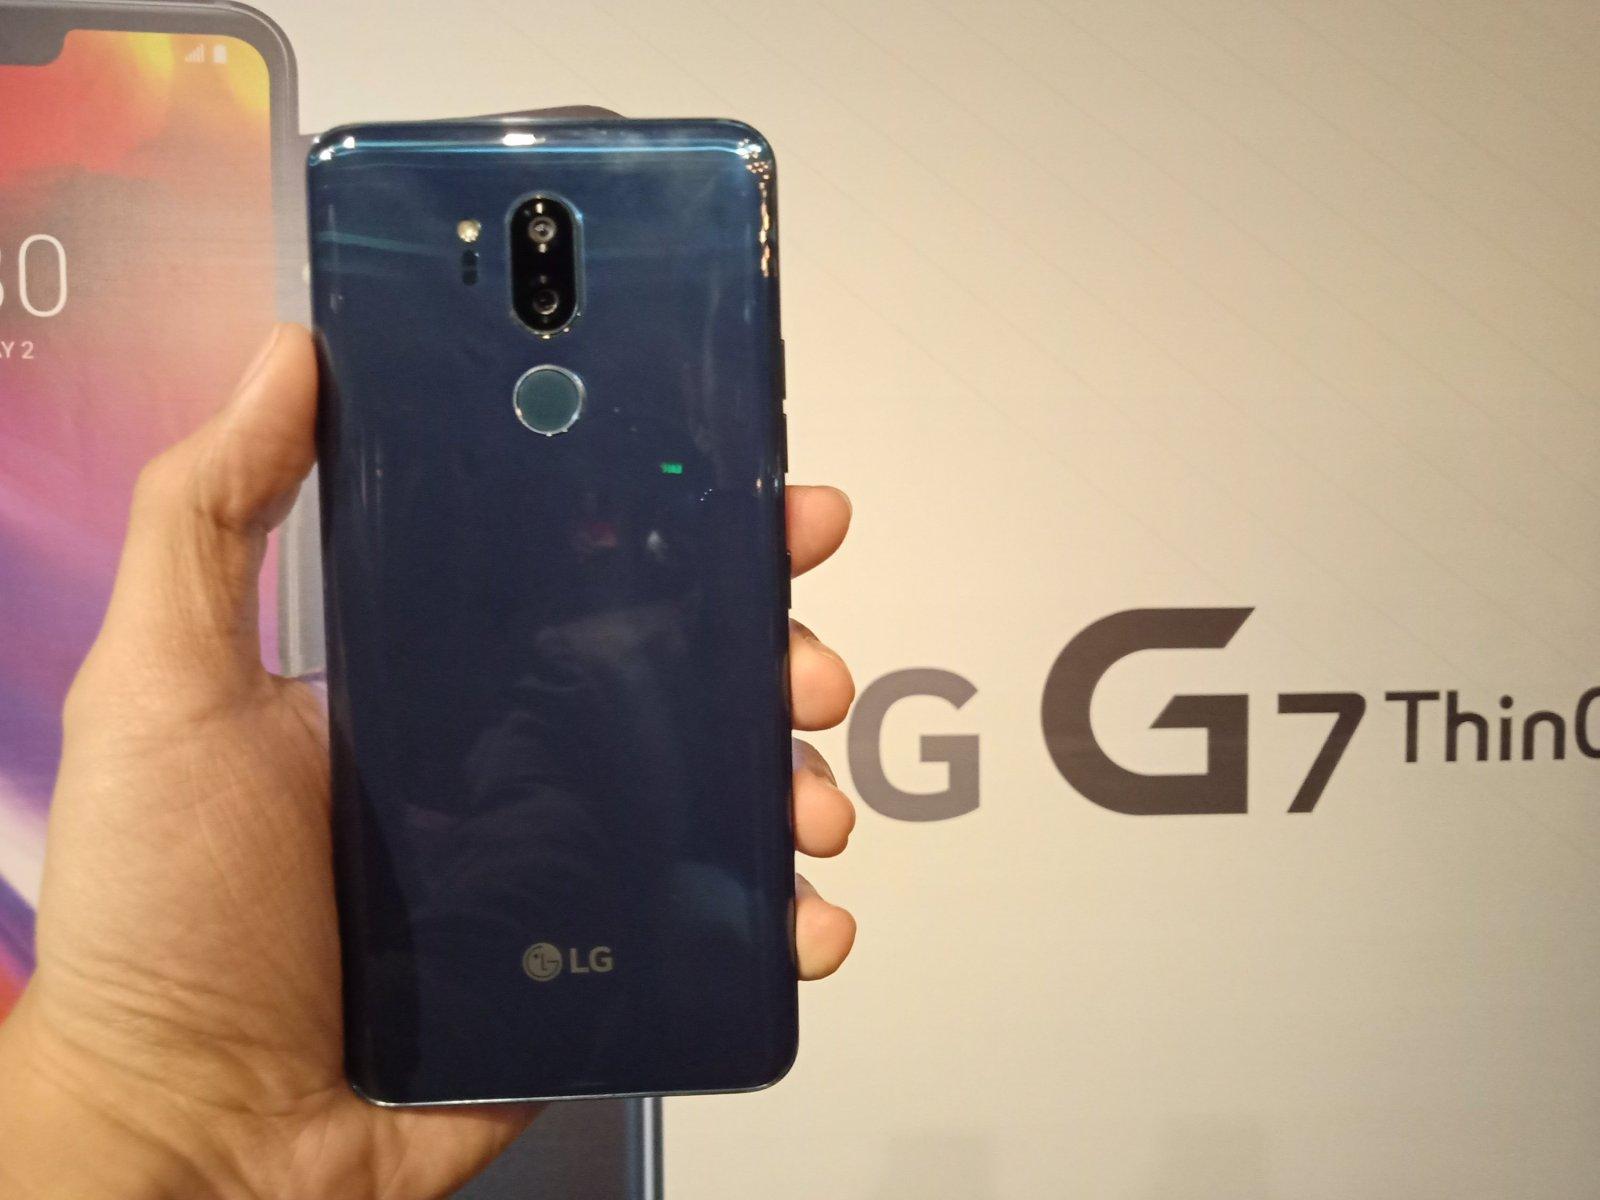 LG G7 ThinQ back handheld